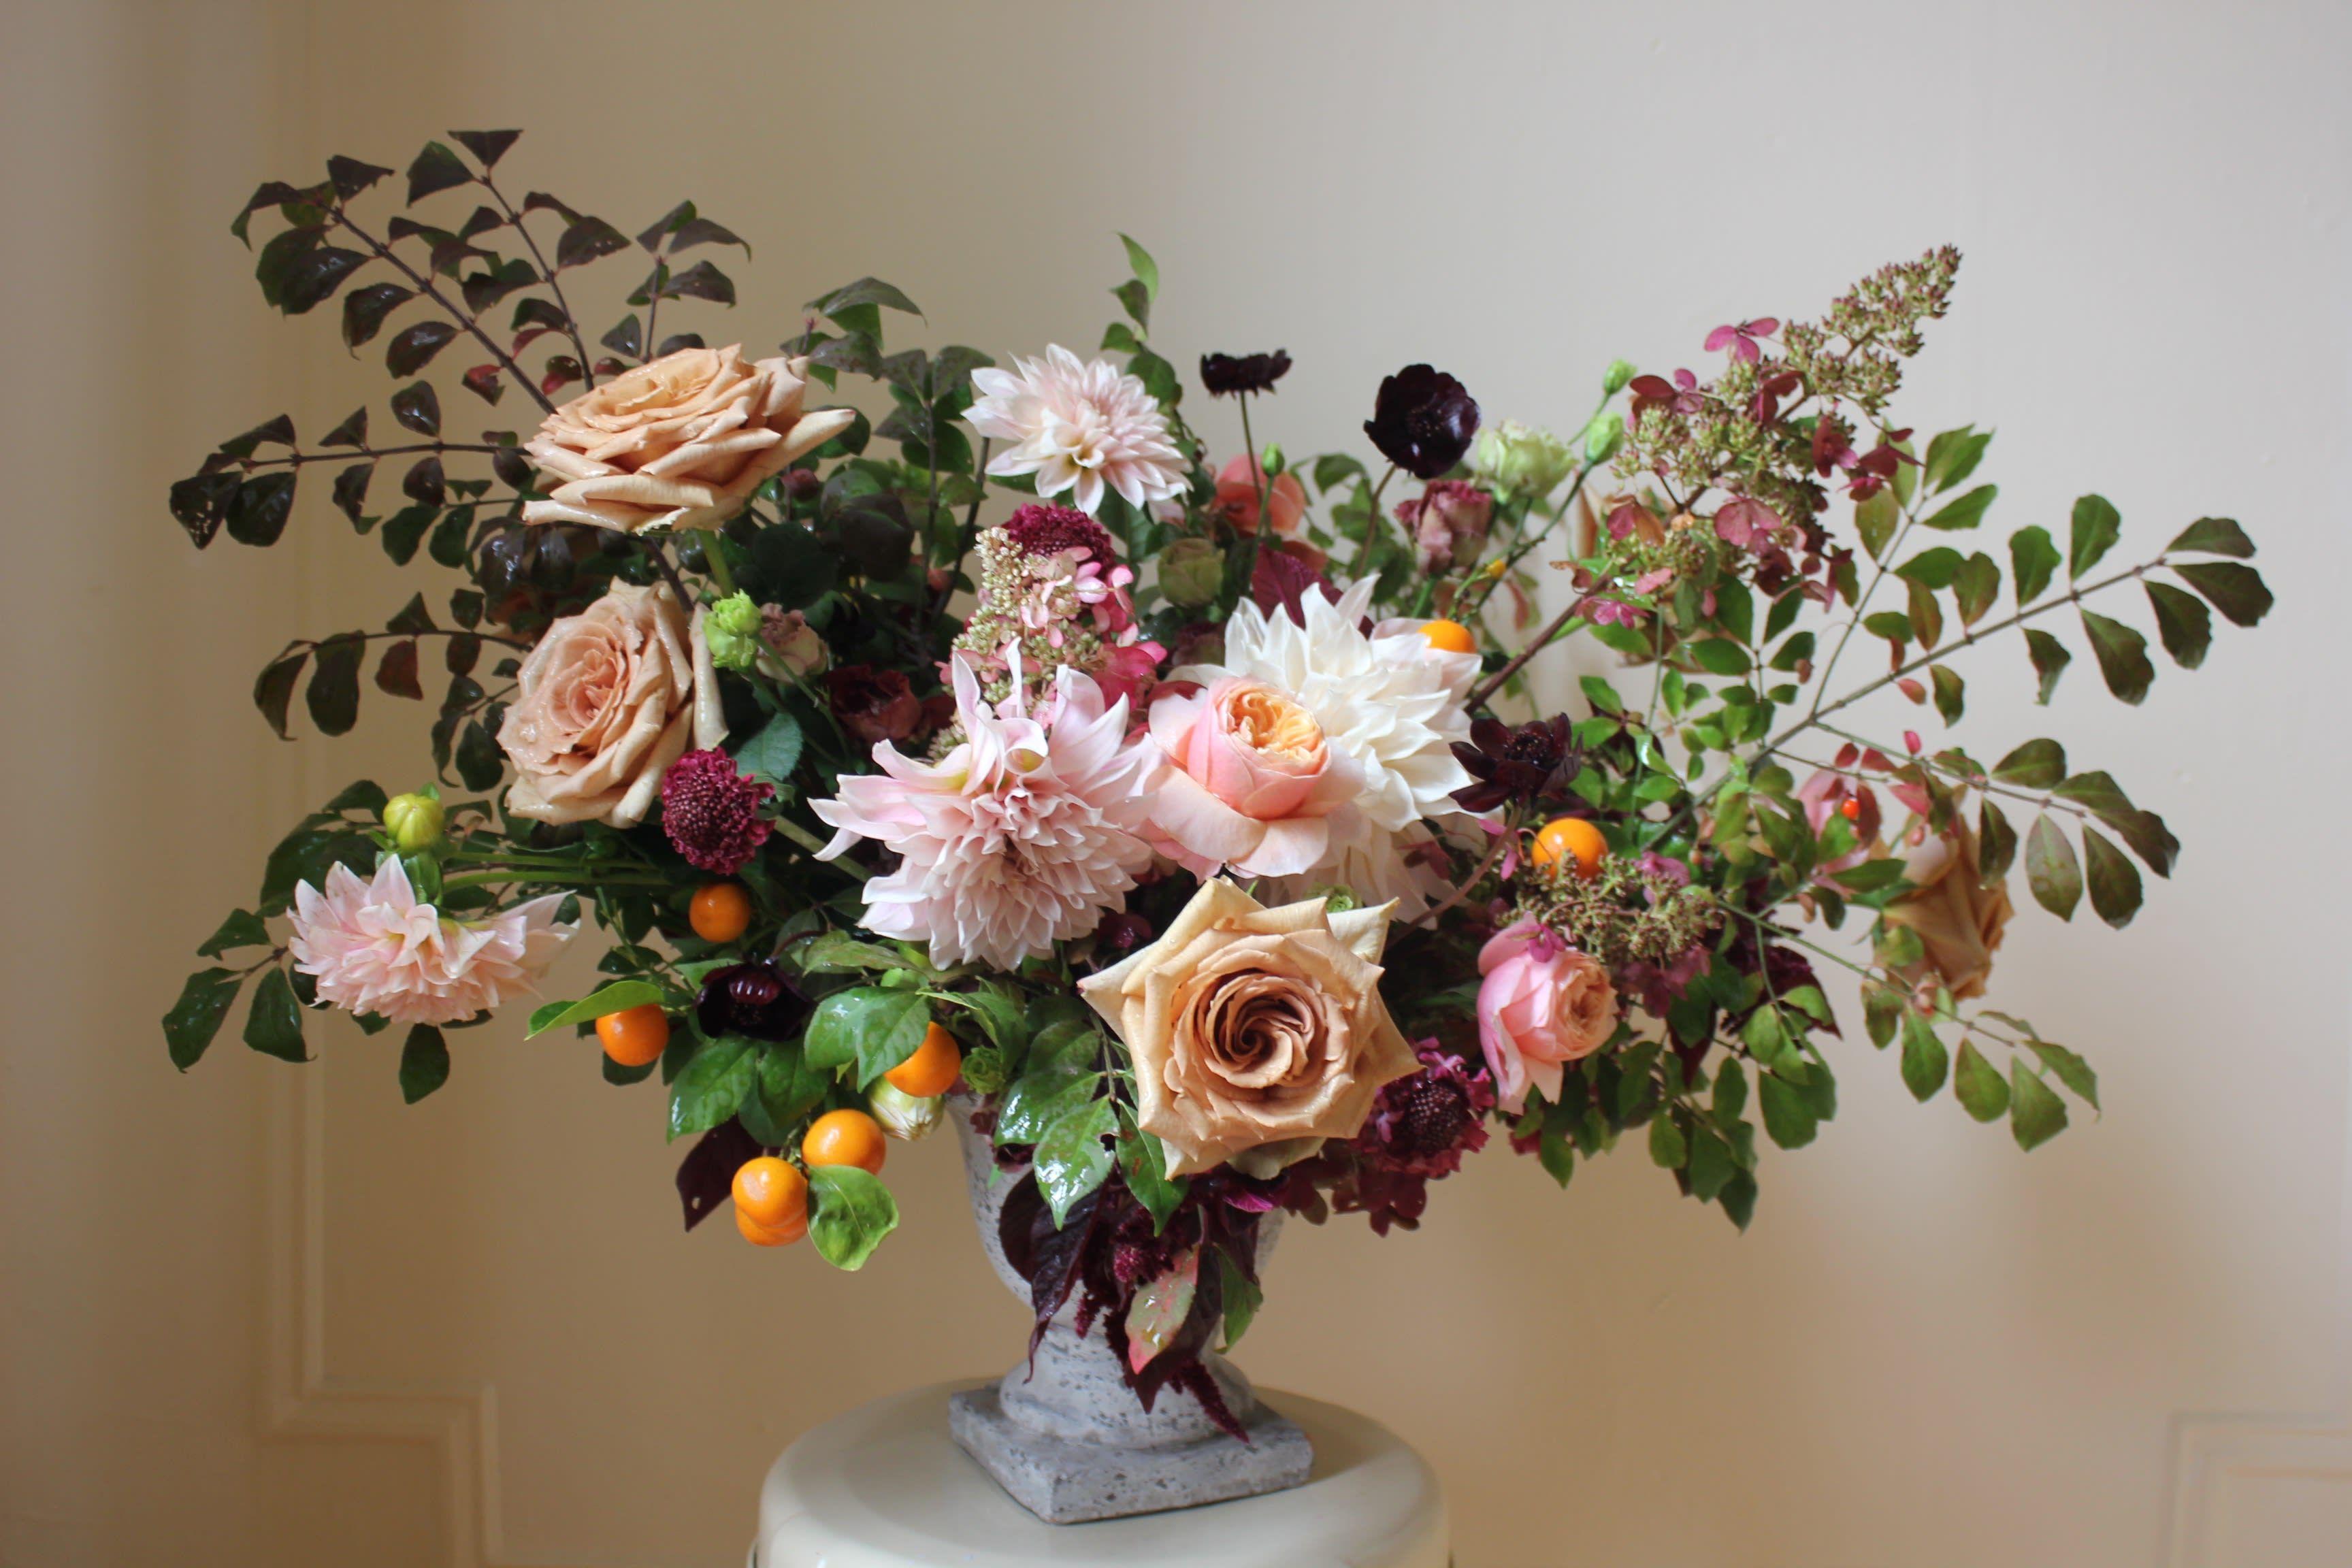 2019 S Trendiest Wedding Flowers Are Wildly Unexpected Wedding Flower Trends Wedding Flowers Dyed Flowers